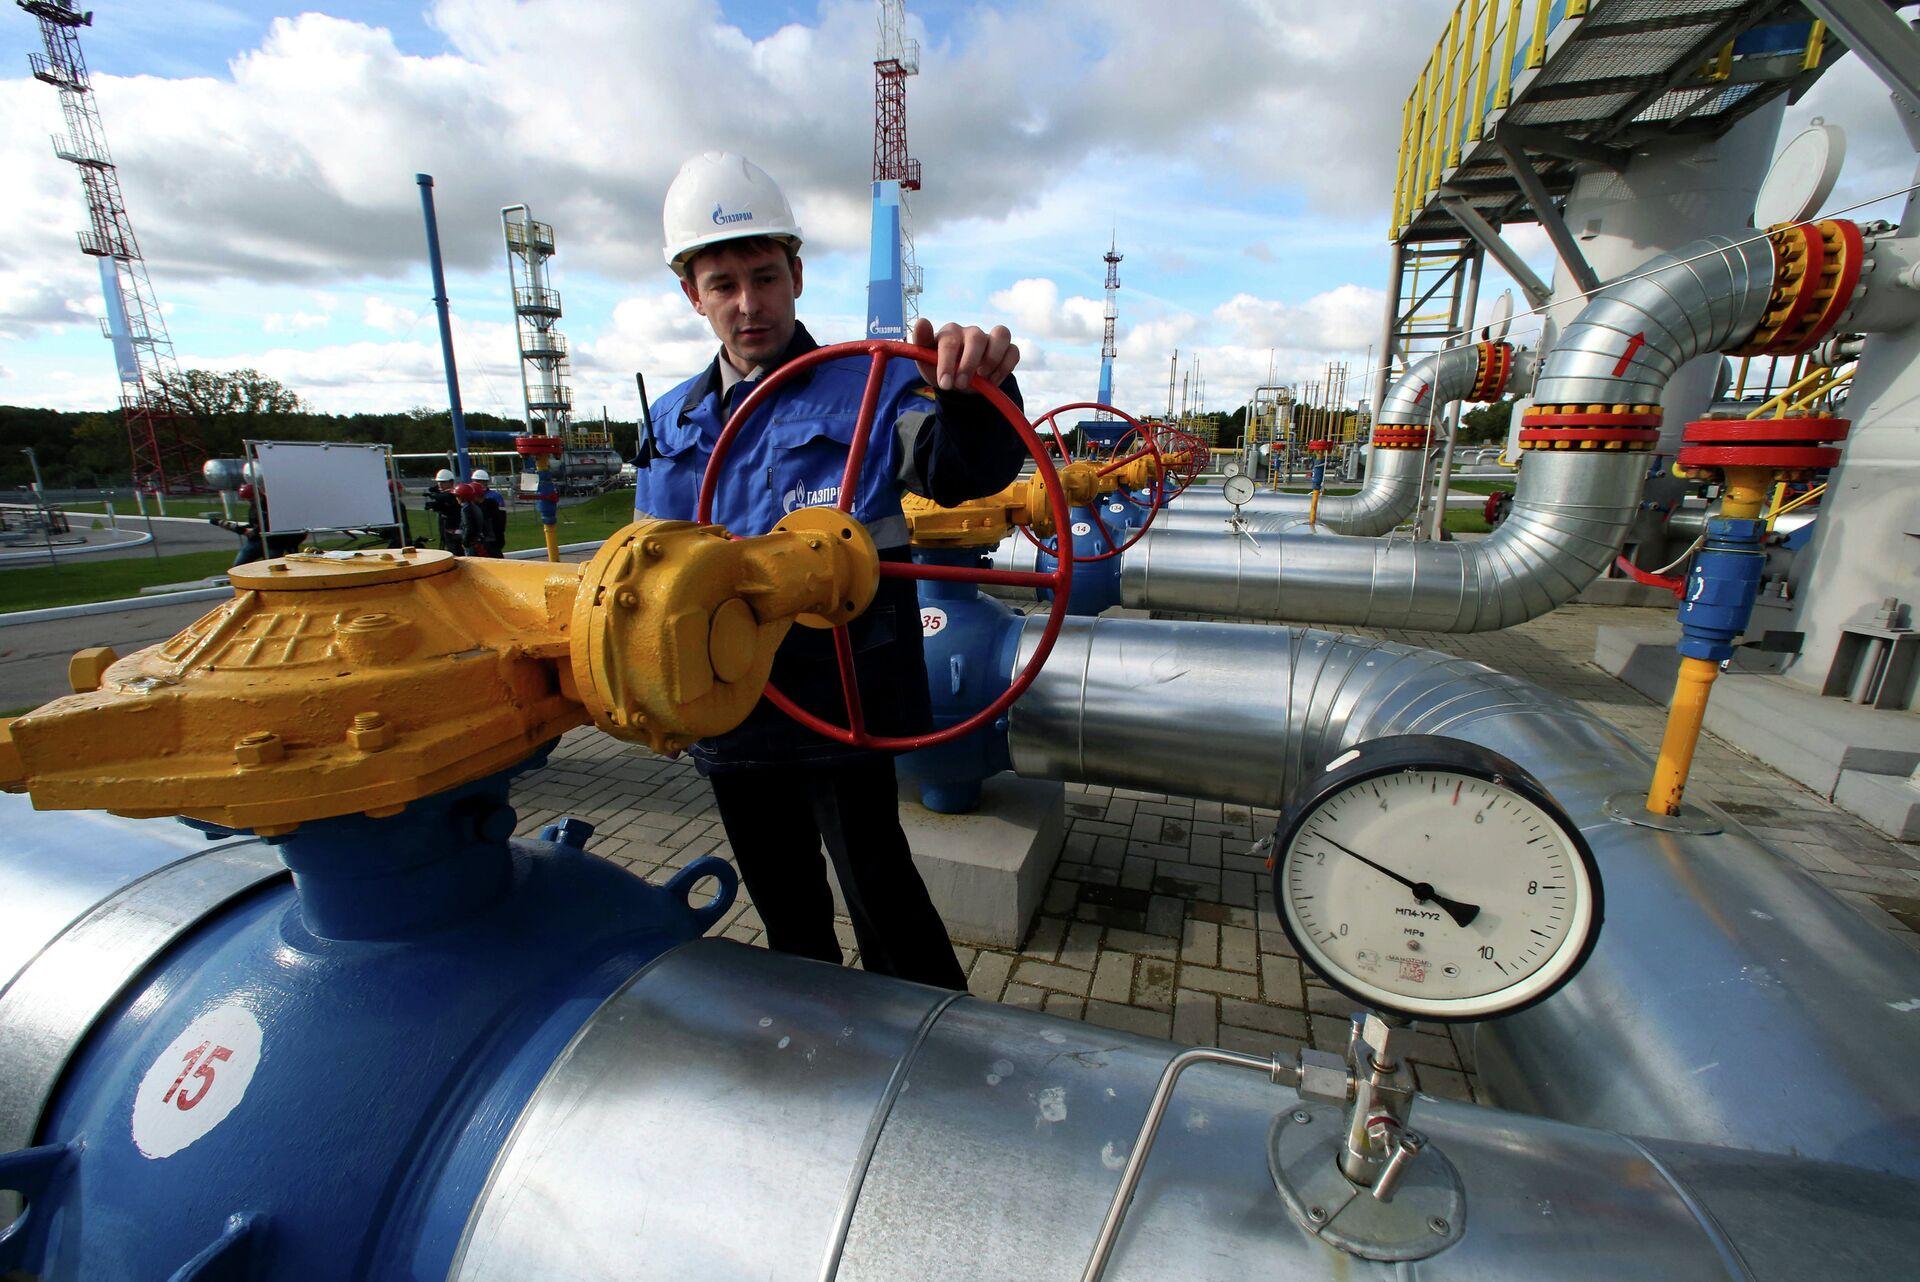 Работник Газпрома на газохранилище - РИА Новости, 1920, 08.10.2021